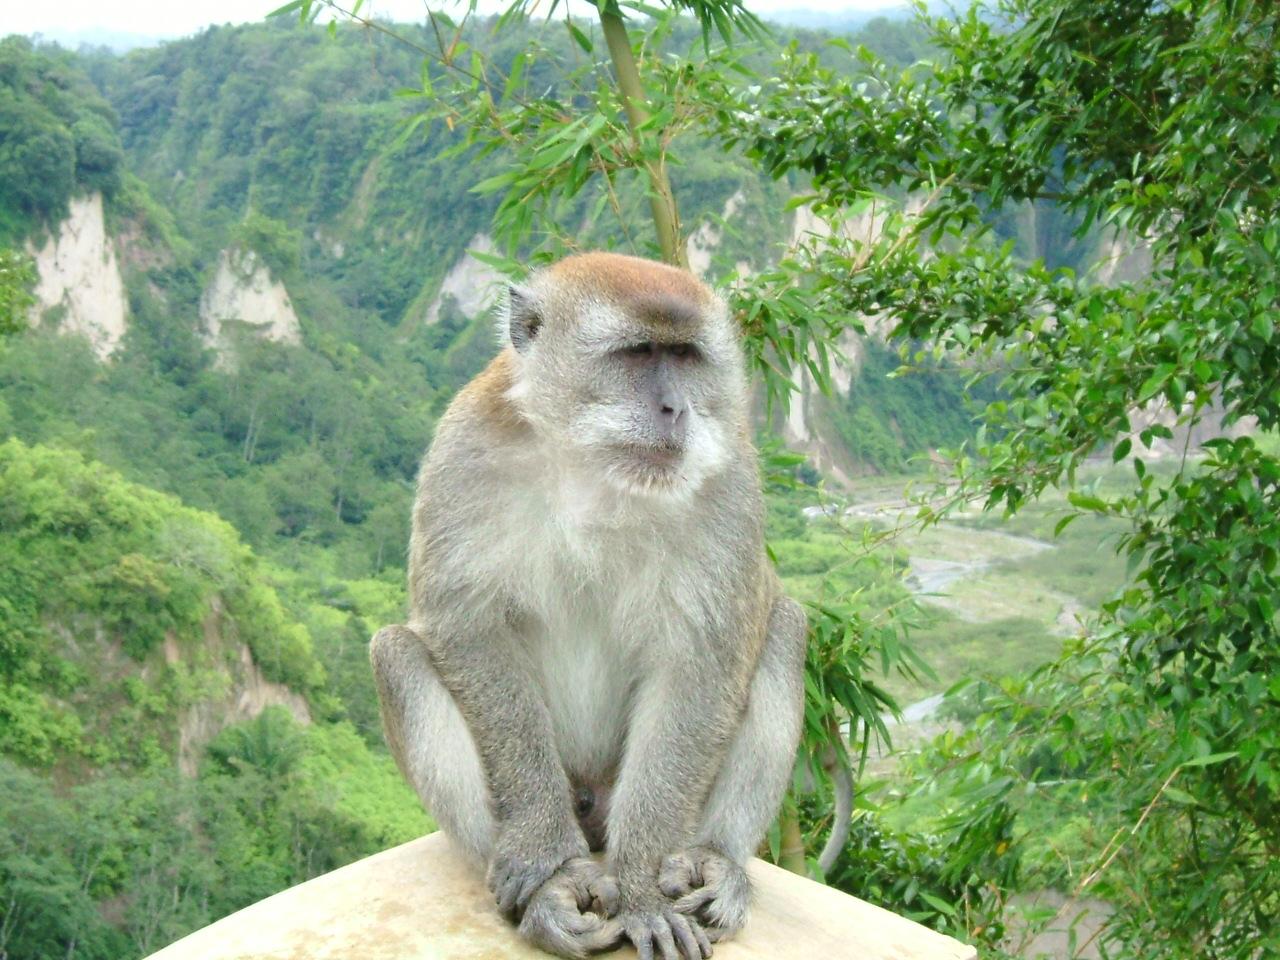 https://upload.wikimedia.org/wikipedia/commons/5/53/Ngarai_Sianok_sumatran_monkey.jpg